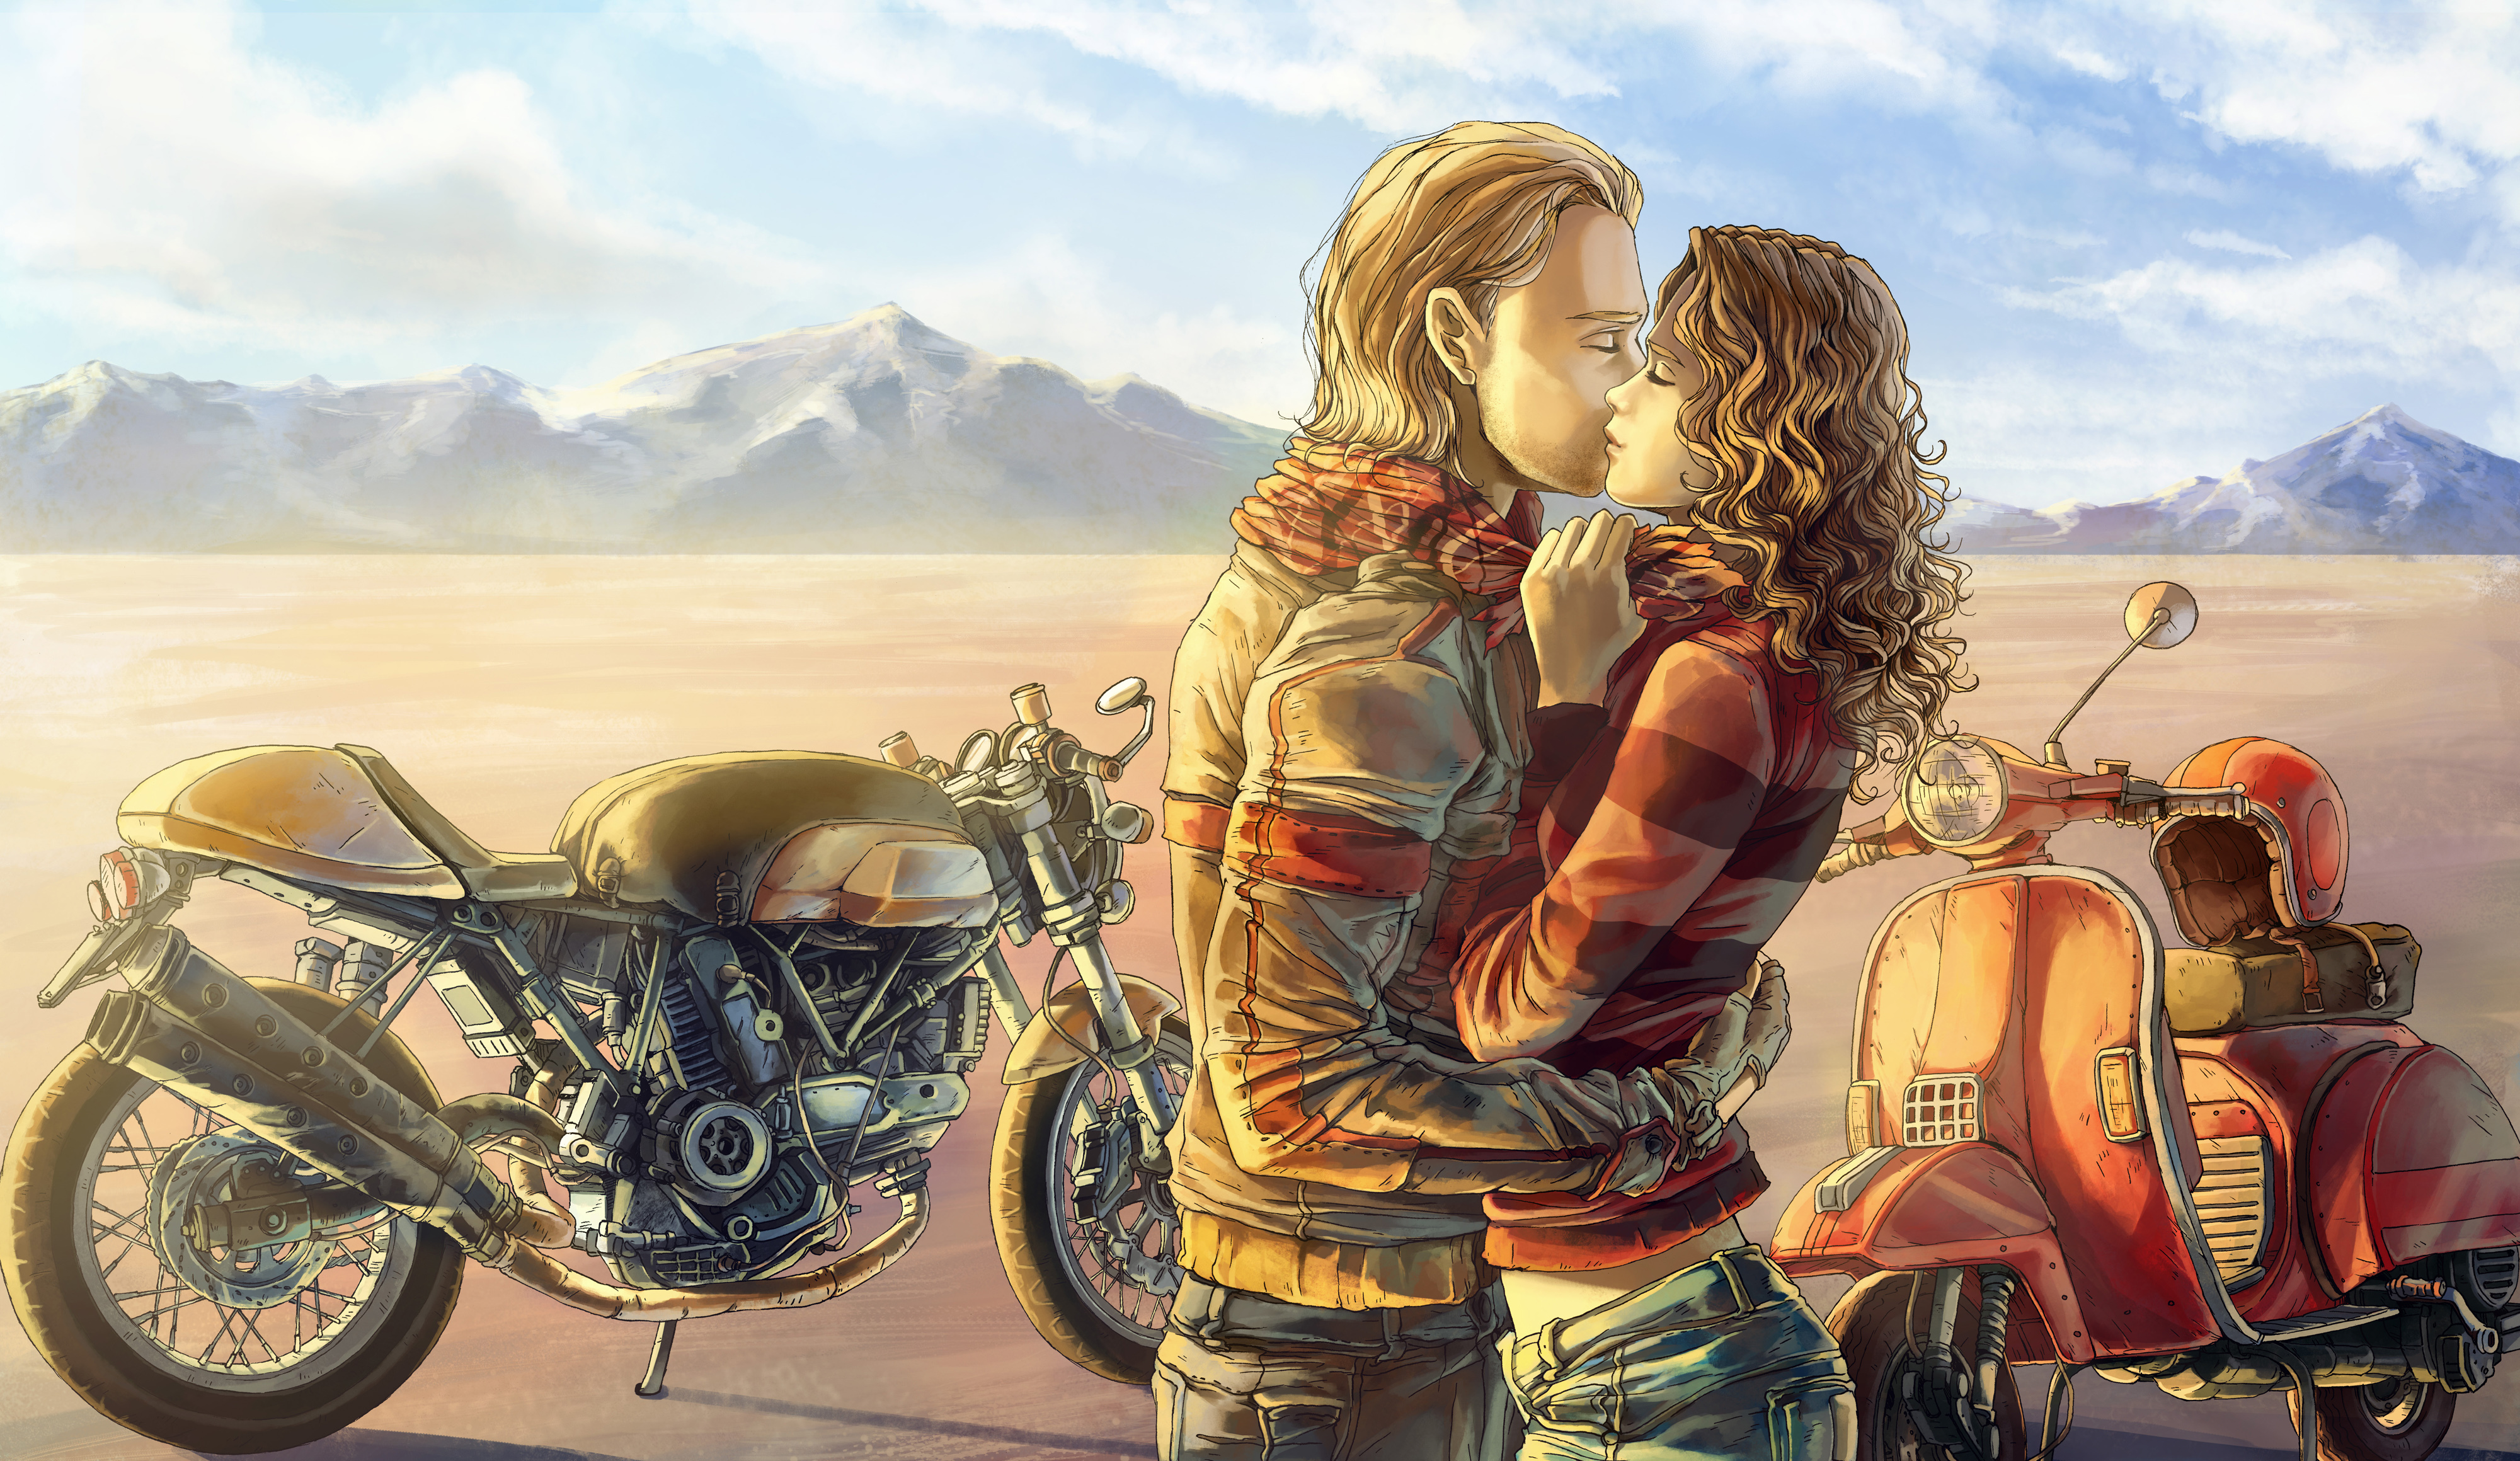 Mood Kiss Love Motorbike Bike Art Painting G Wallpaper 4000x2319